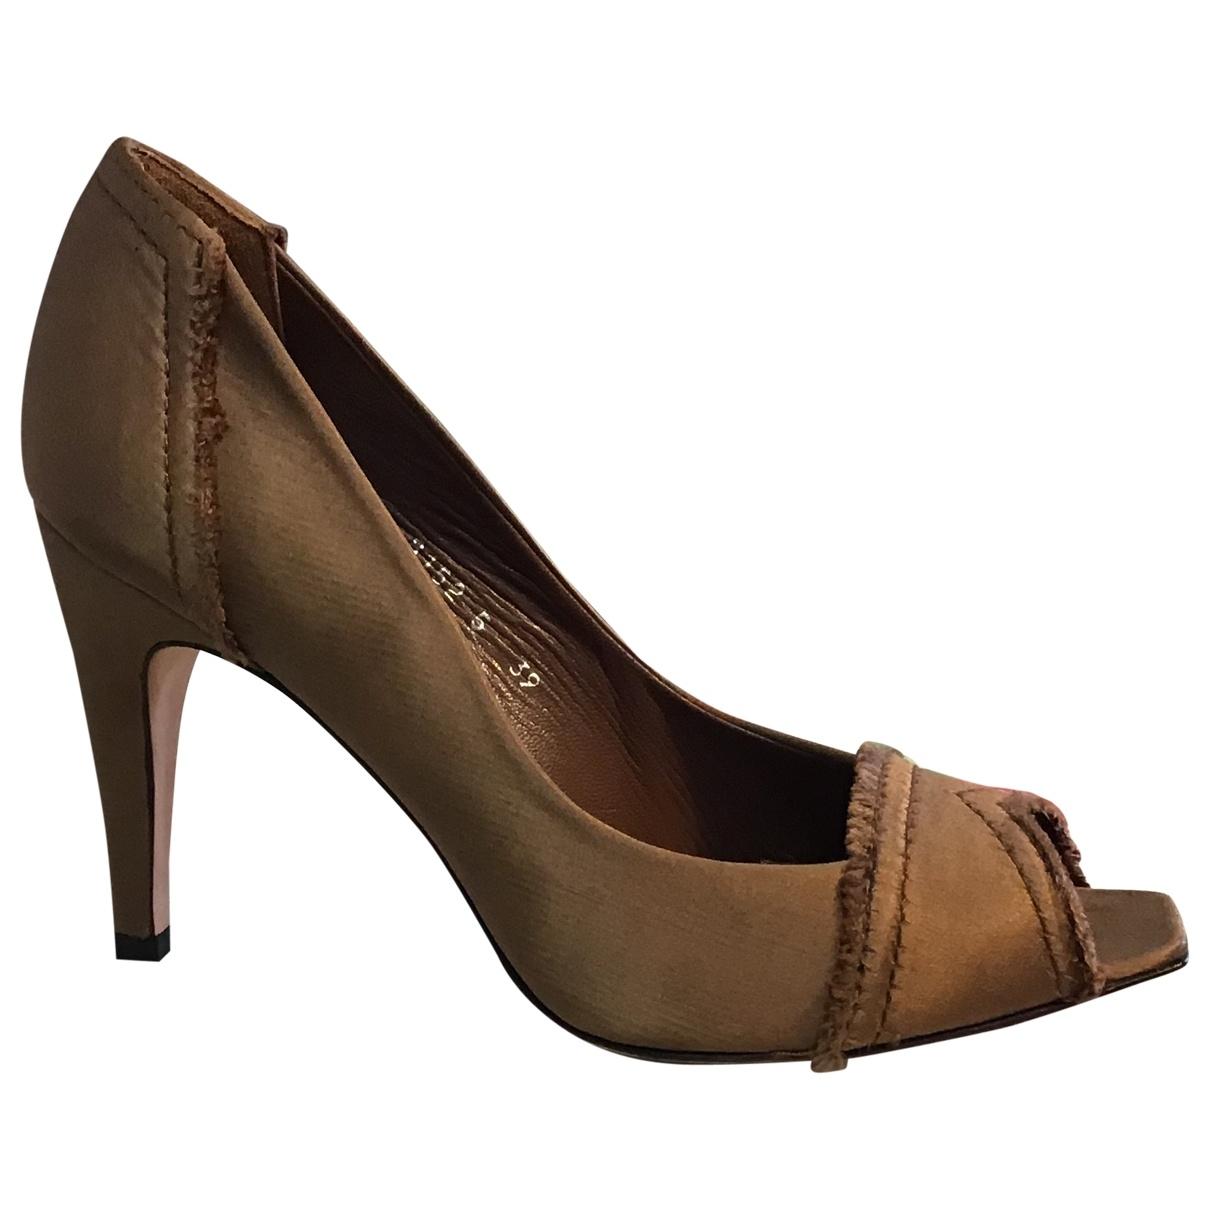 Pedro Garcia \N Khaki Cloth Heels for Women 39 EU